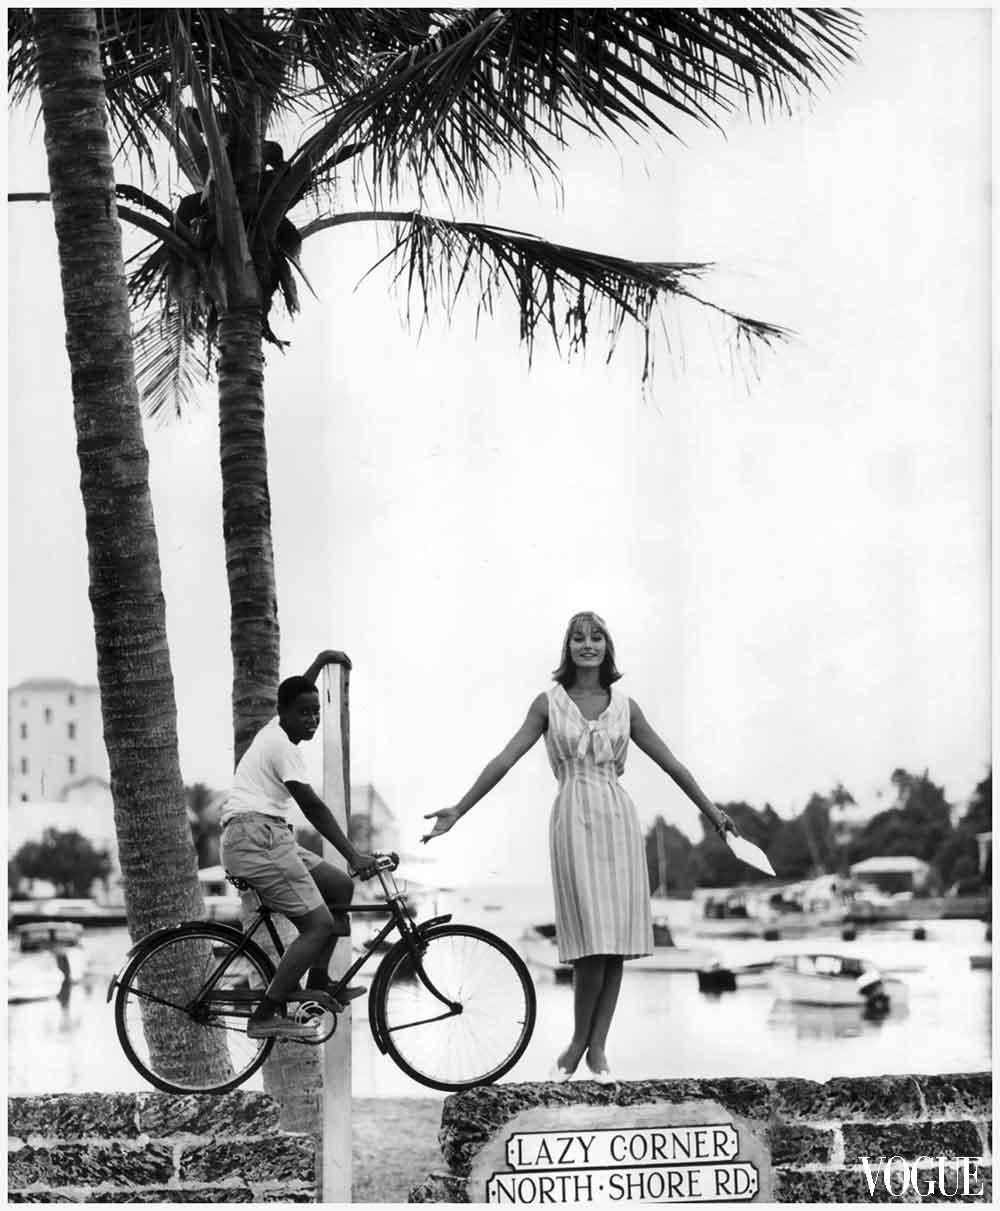 photo-eugc3a8ne-vernier-tania-mallet-in-the-inlet-of-flatts-village-bermuda-vogue-january-1961